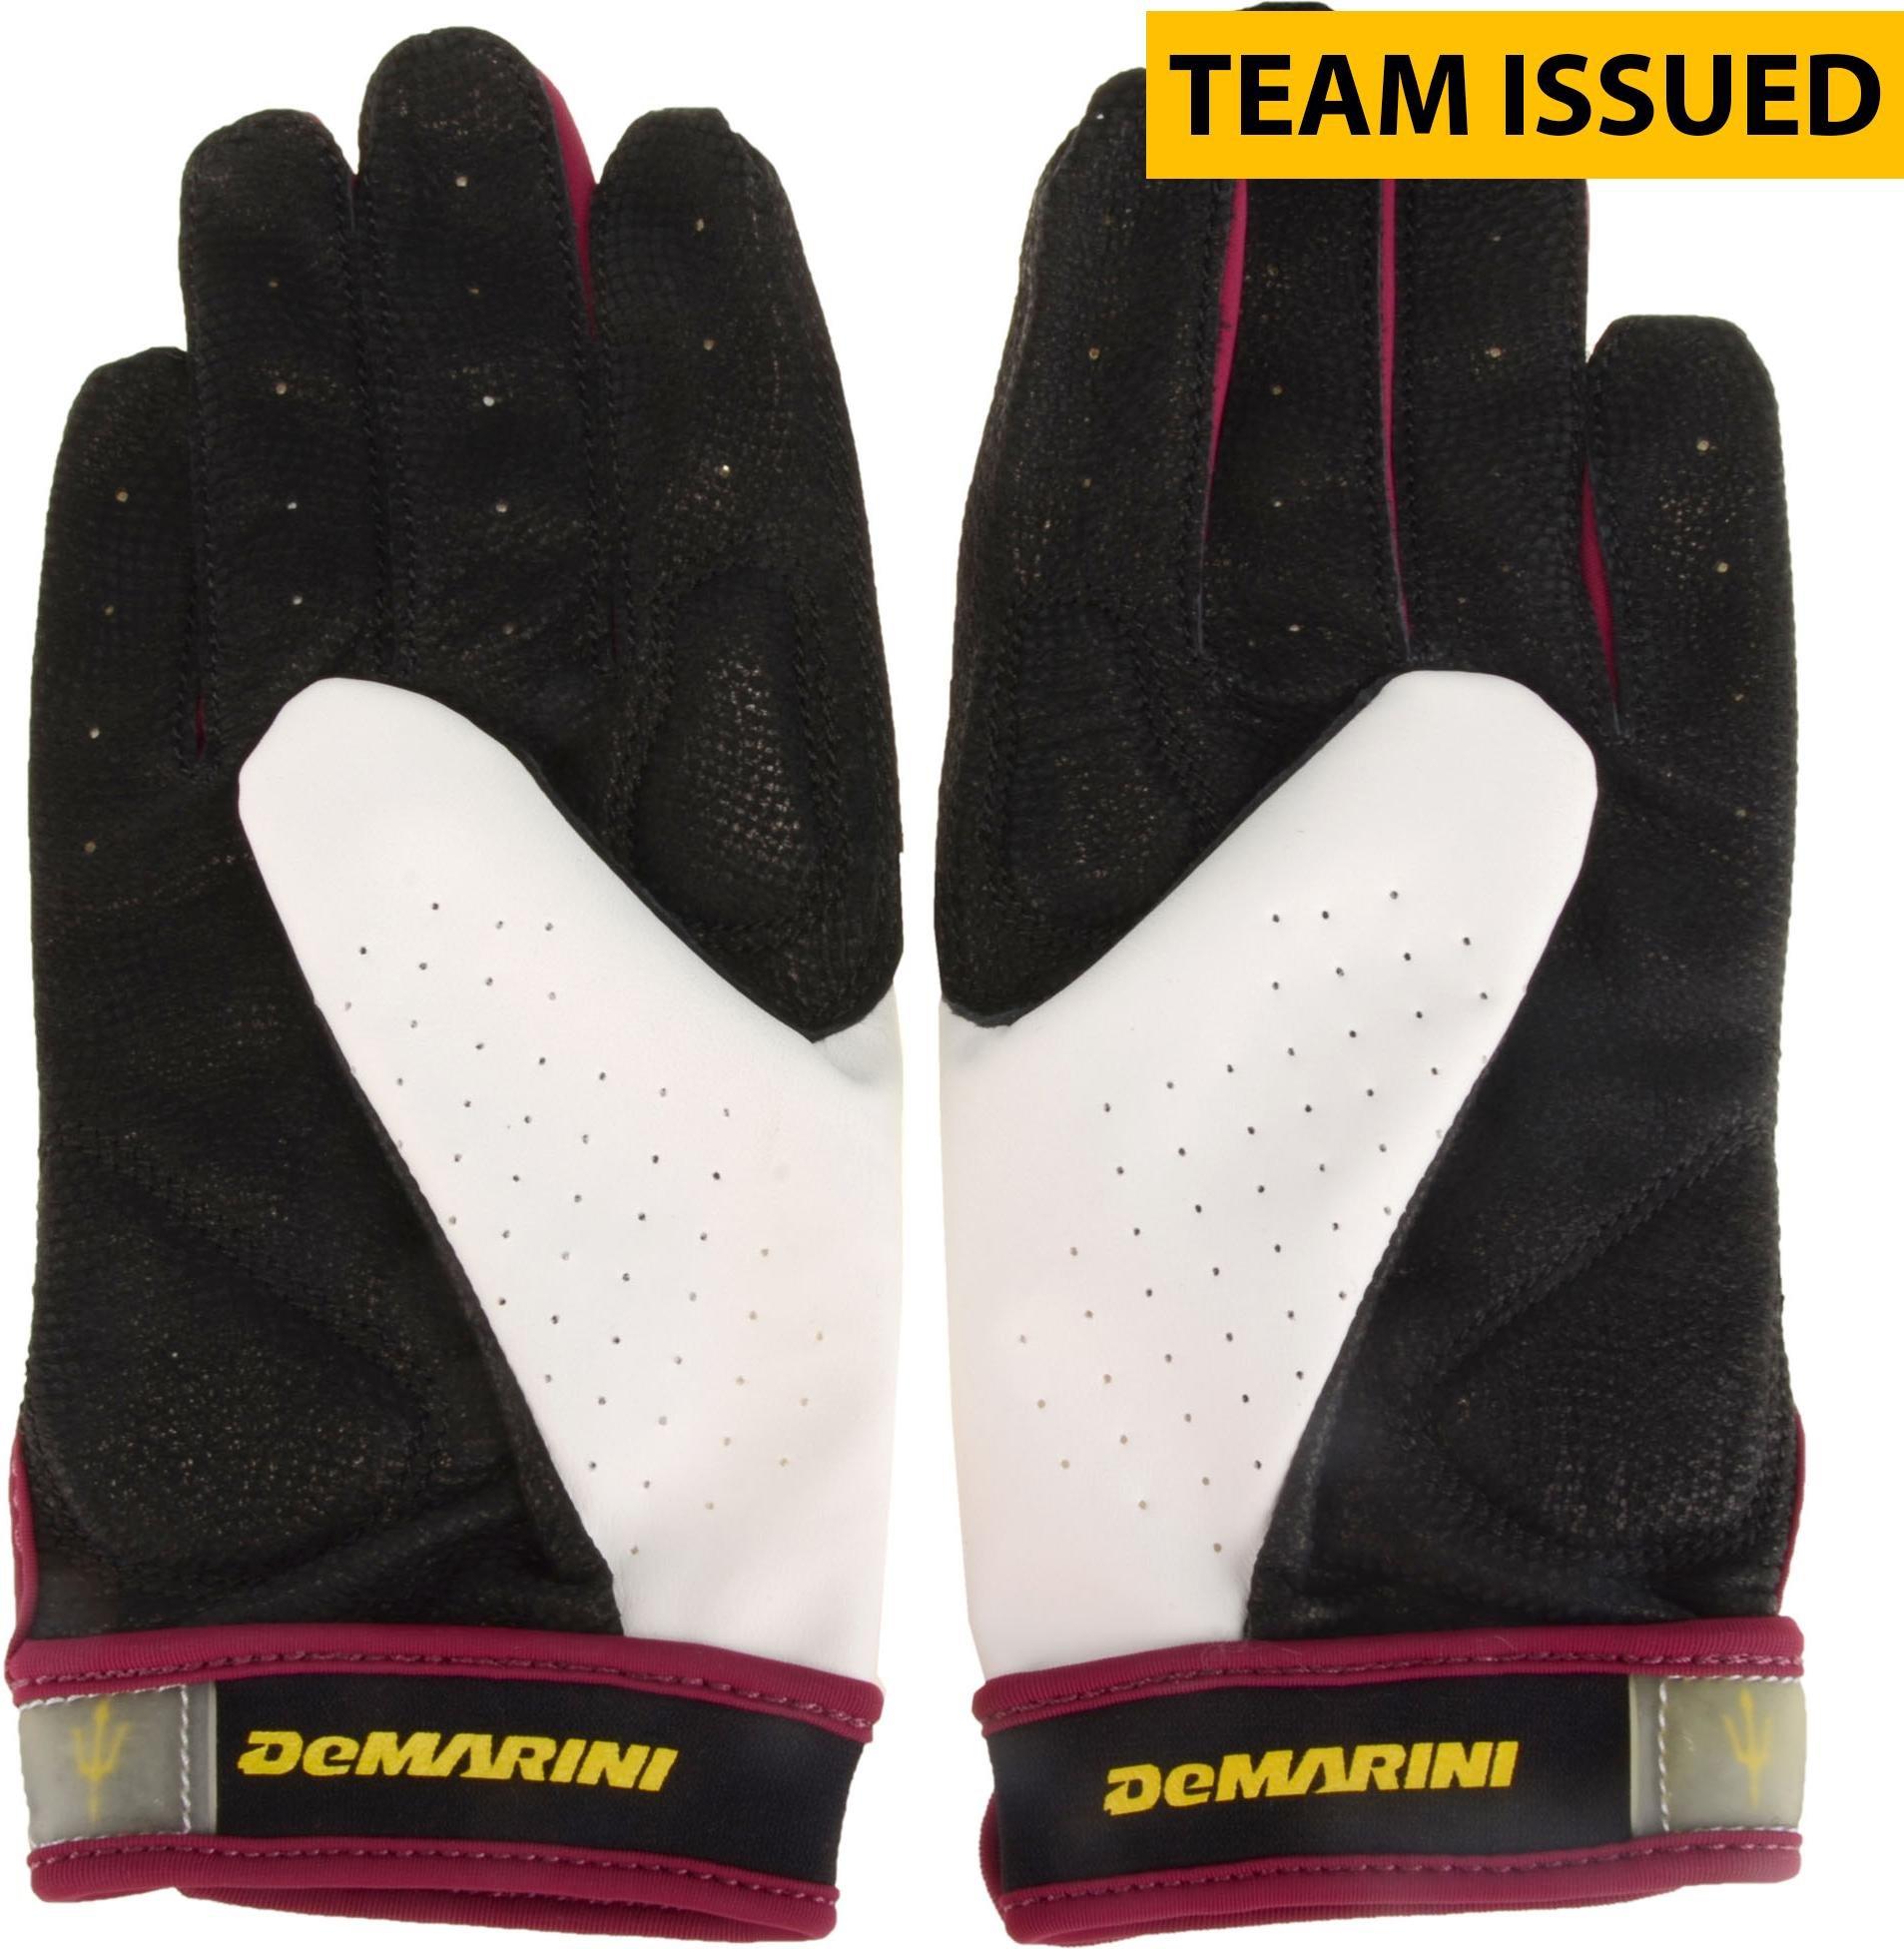 Arizona State Sun Devils Team Issued Maroon and White DeMarini Pair of Softball Gloves Size Medium Fanatics Authentic Certified